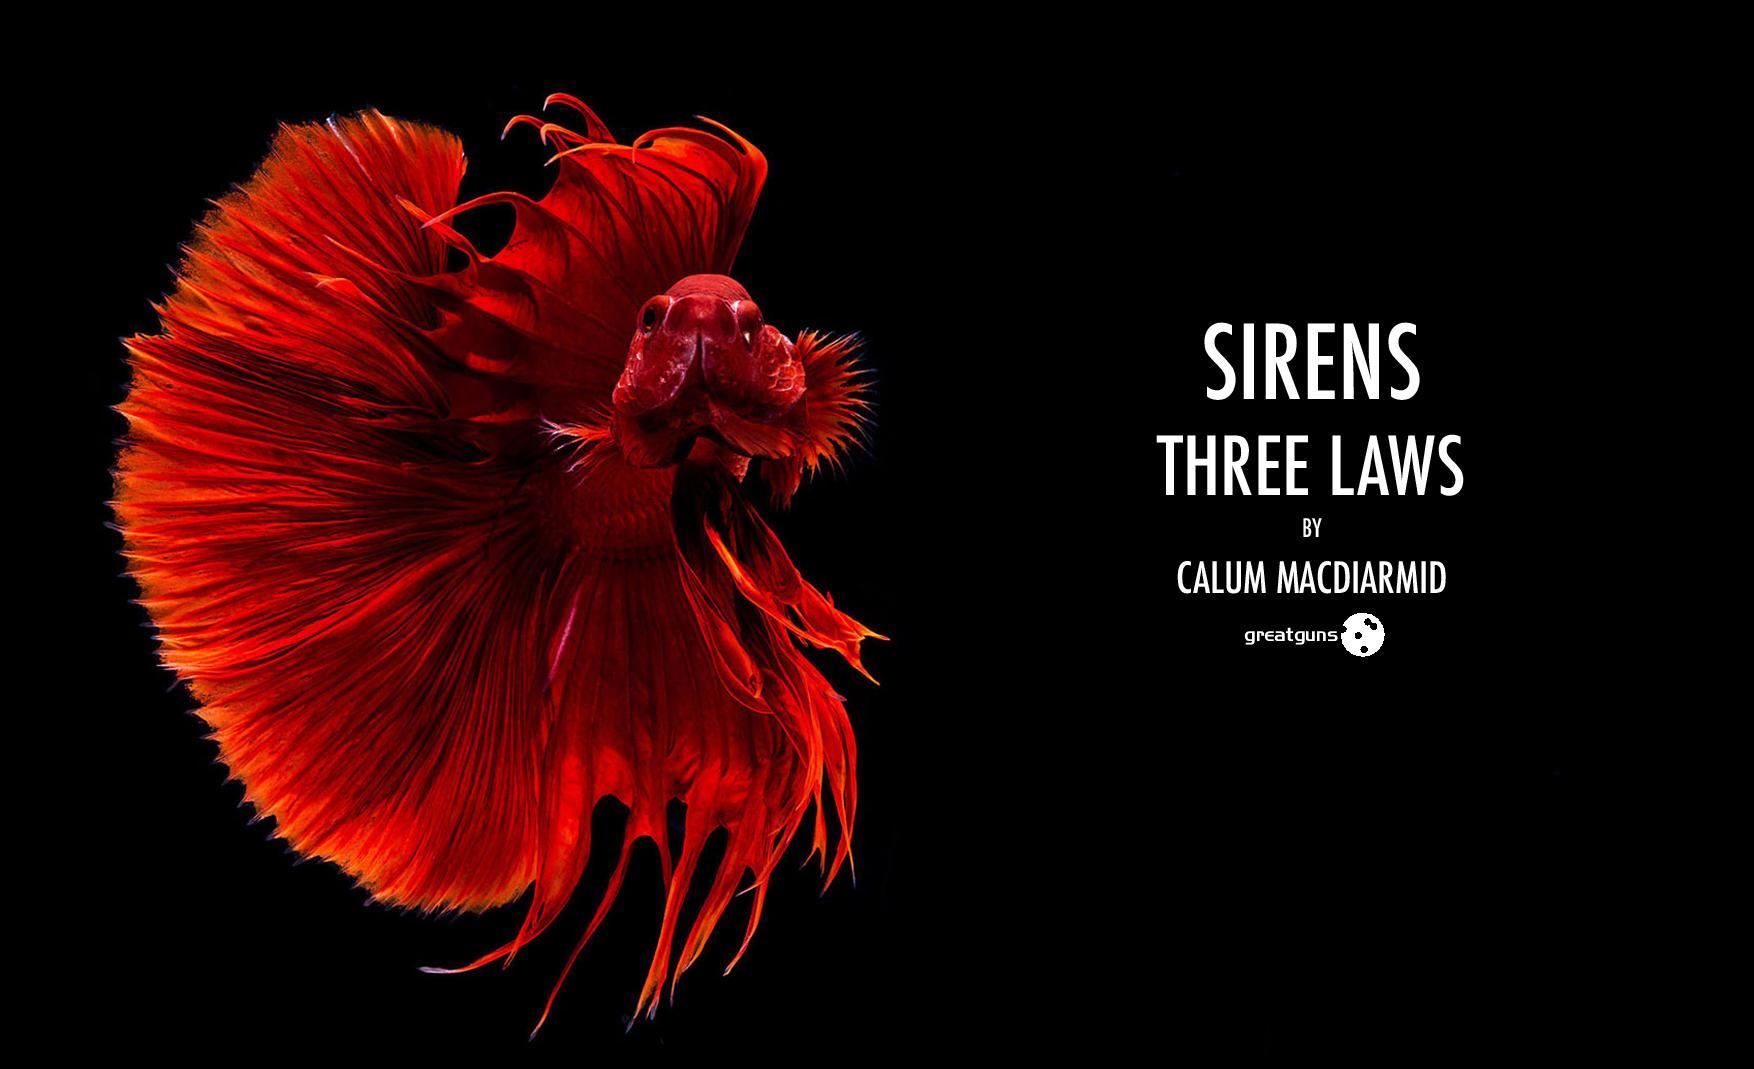 Sirens-page-001.jpg